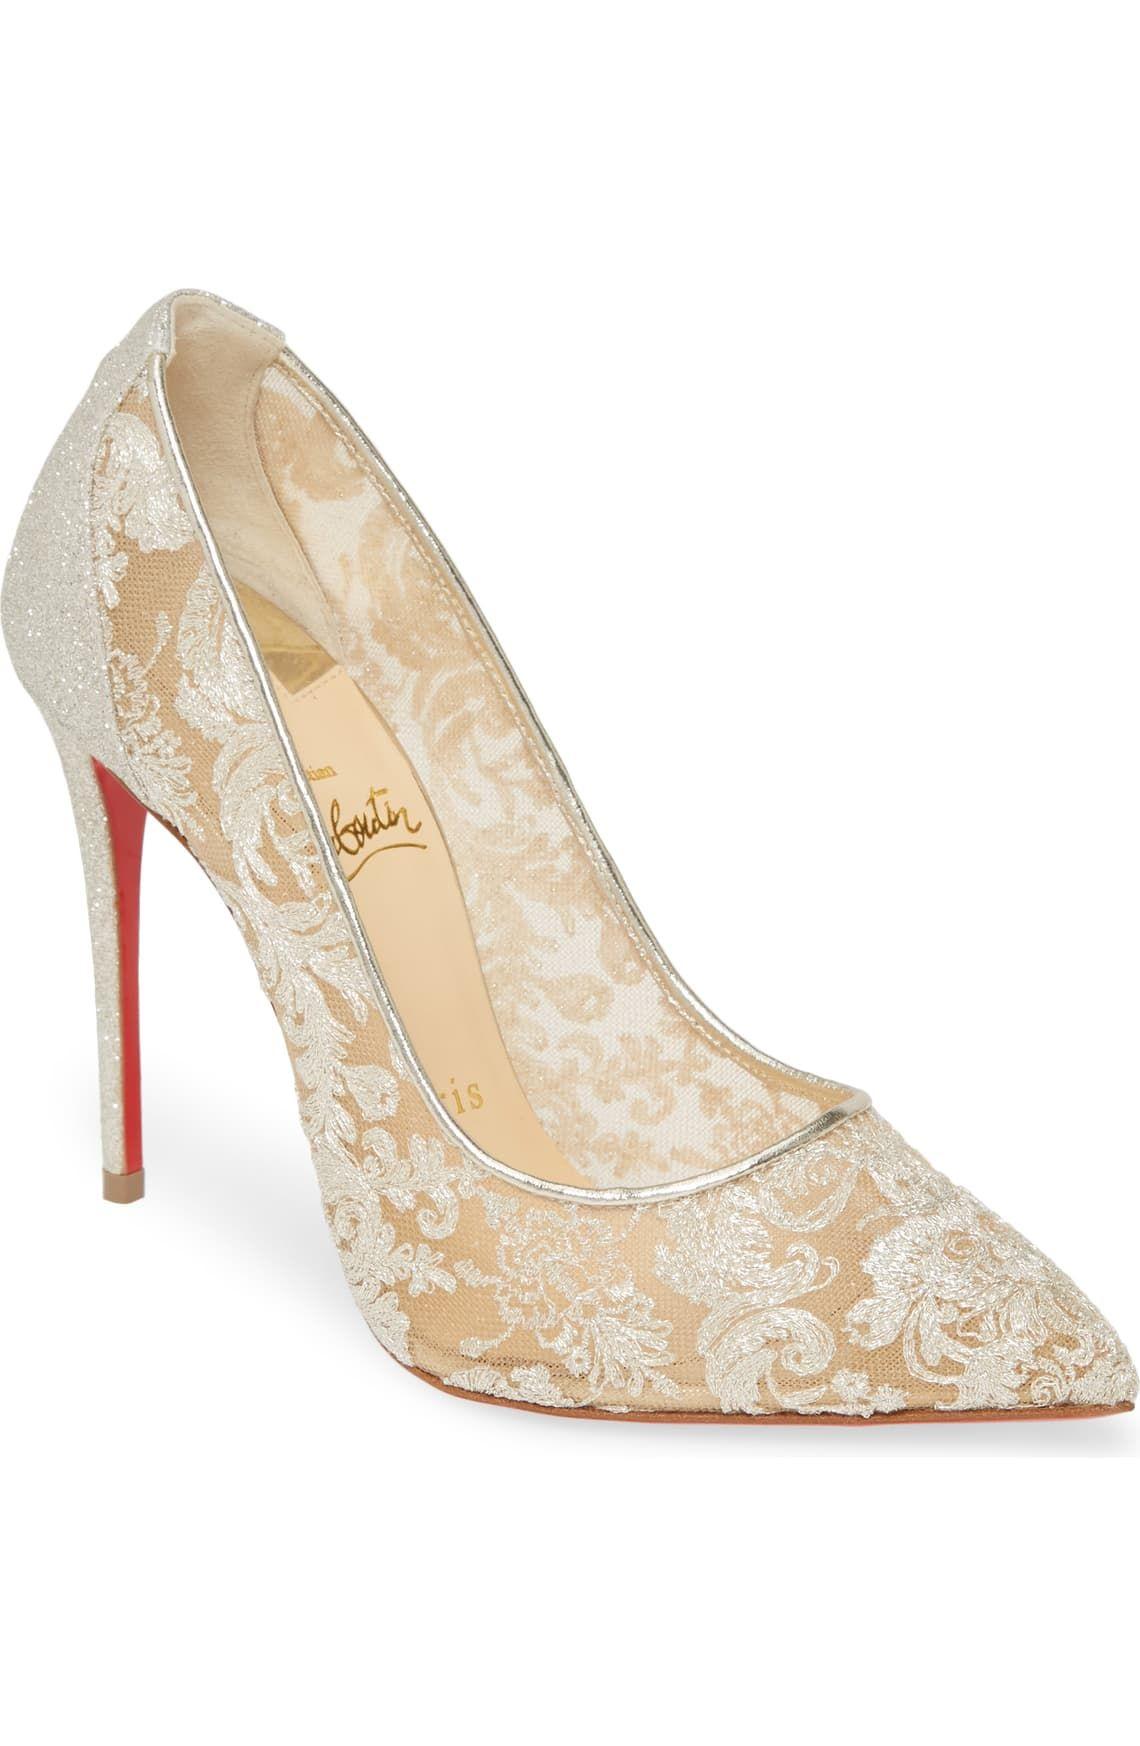 Christian Louboutin Follies Lace Pointed Toe Pump Women Nordstrom Christian Louboutin Wedding Shoes Louboutin Wedding Shoes Louboutin Wedding Heels